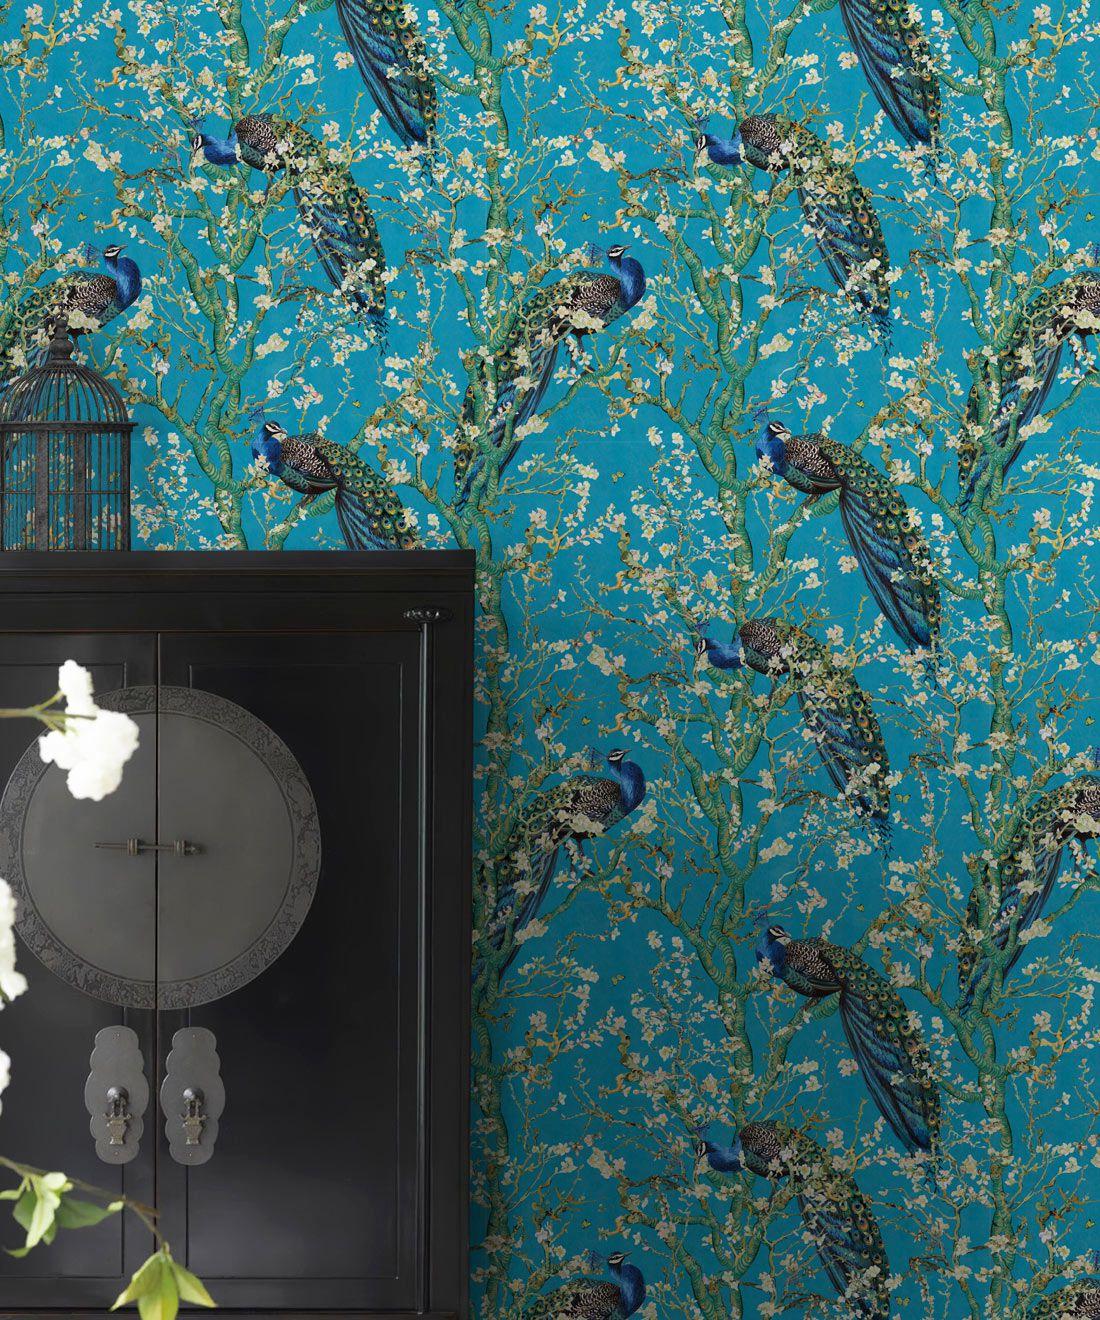 Almond Blossom Wallpaper • Chinoiserie Wallpaper • Wallpaper with Peacocks • Light Blue Duck Egg Wallpaper •Insitu